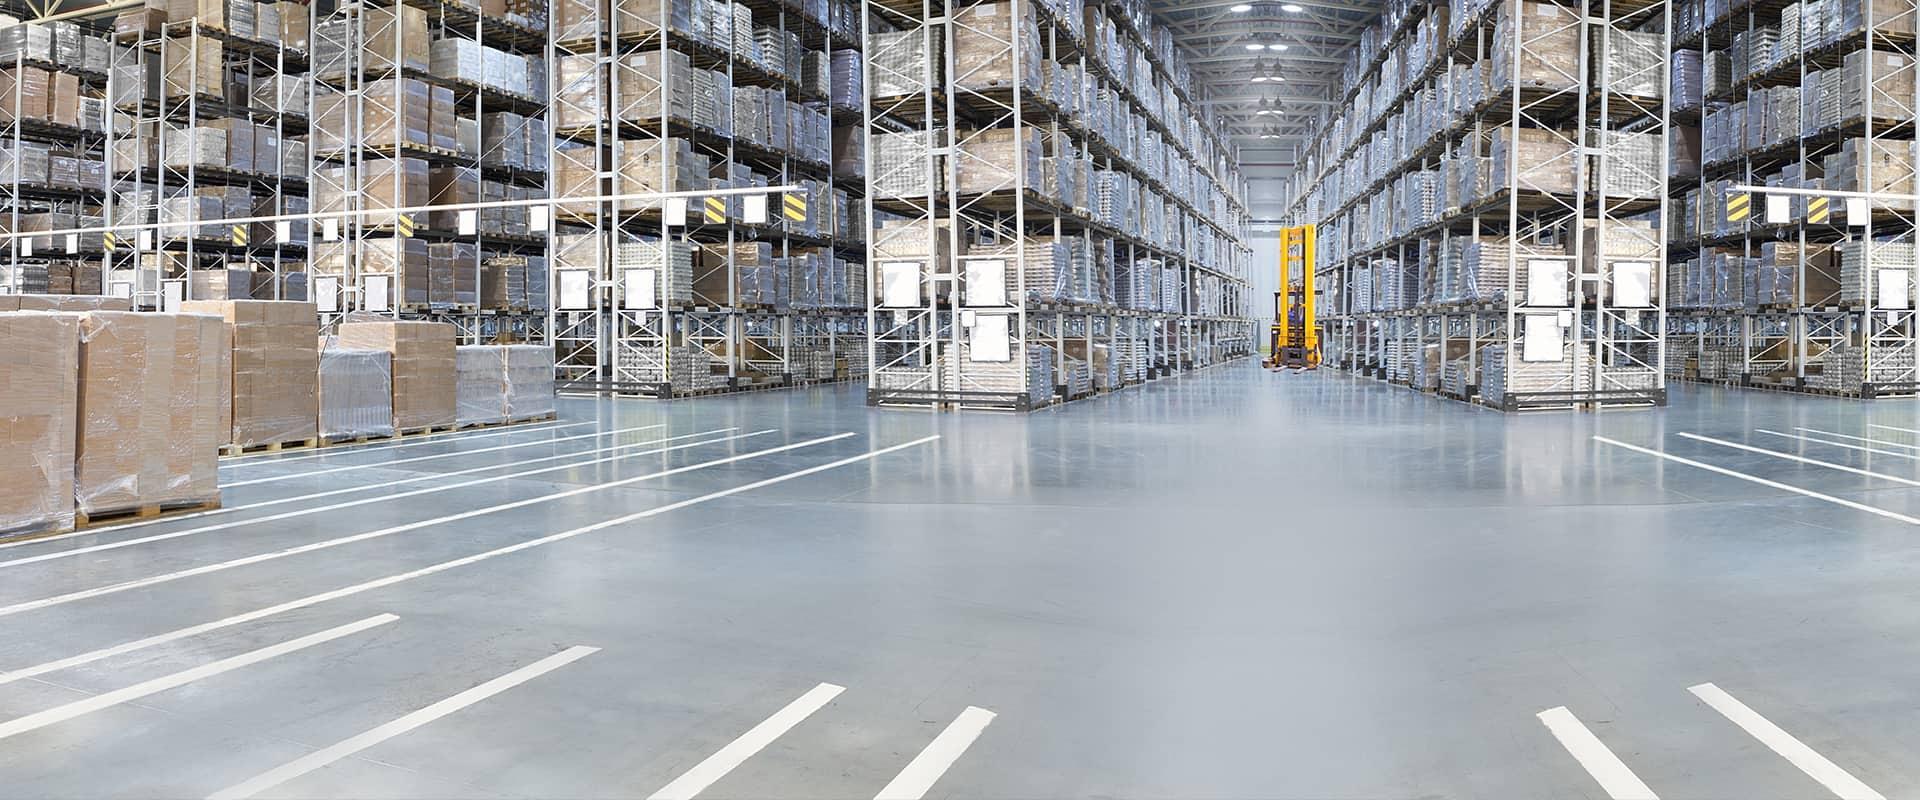 interior view of a warehouse in erie colorado